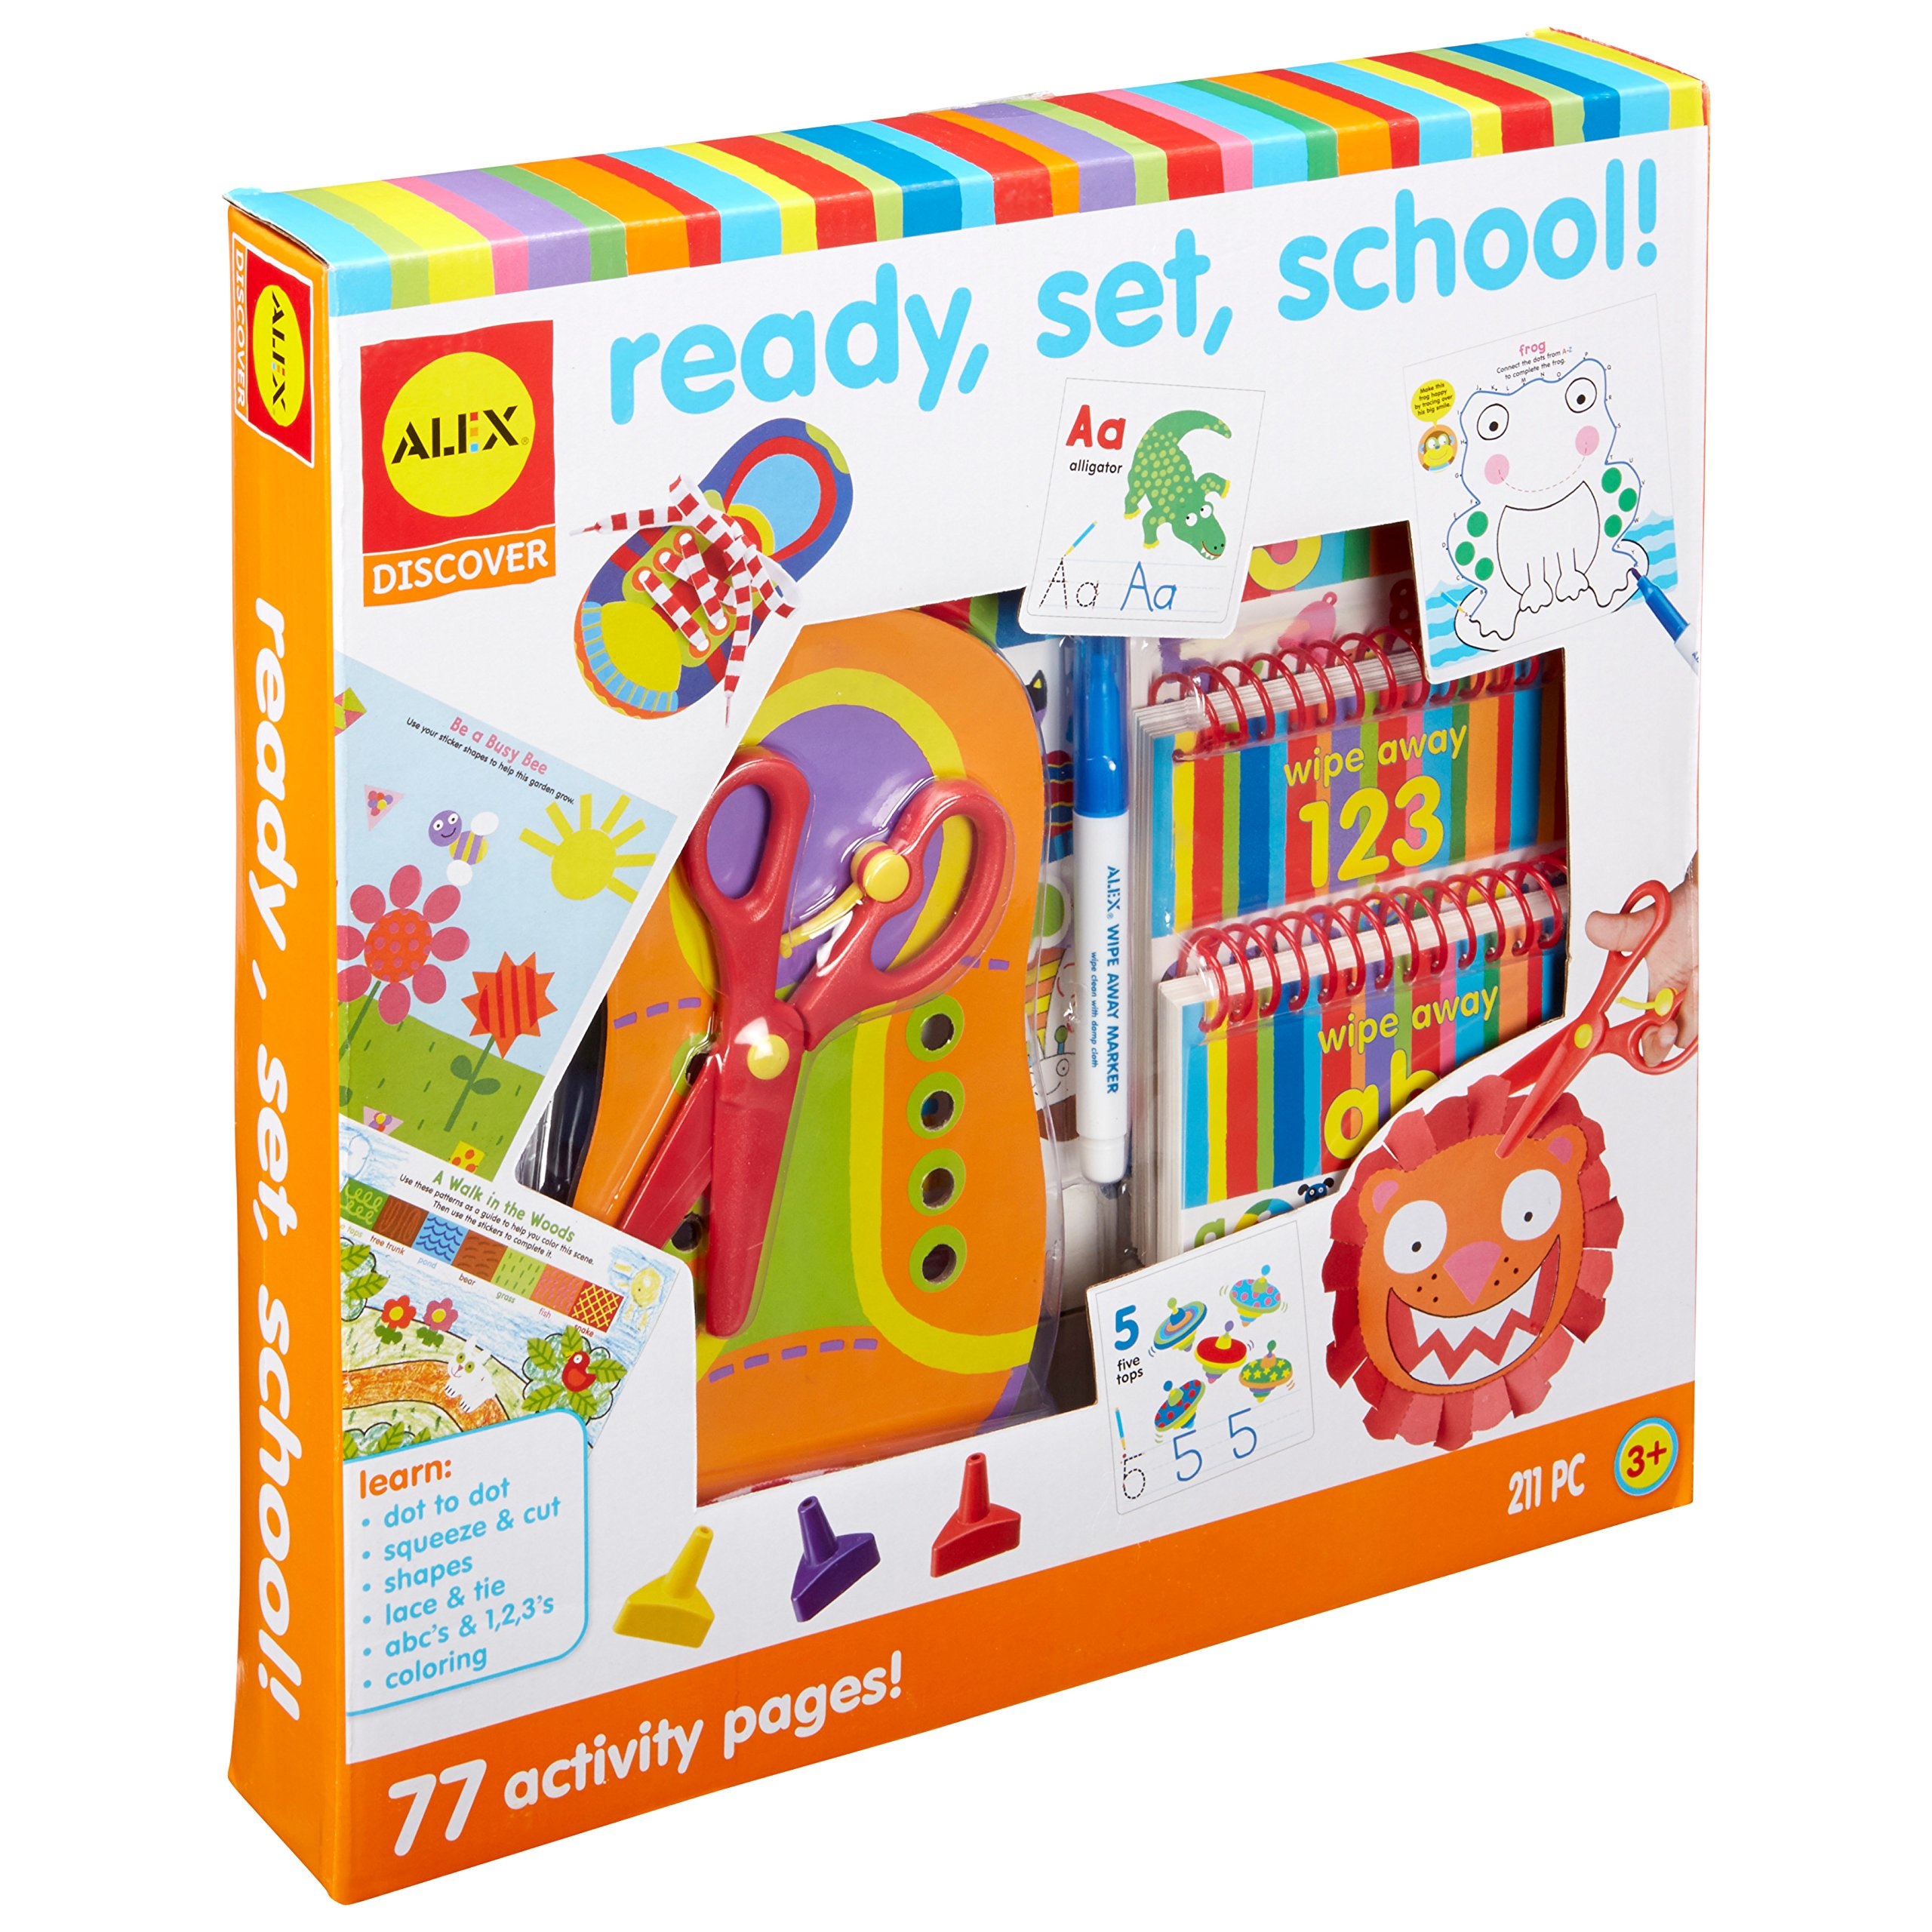 ALEX Discover Ready, Set, School Craft Kit